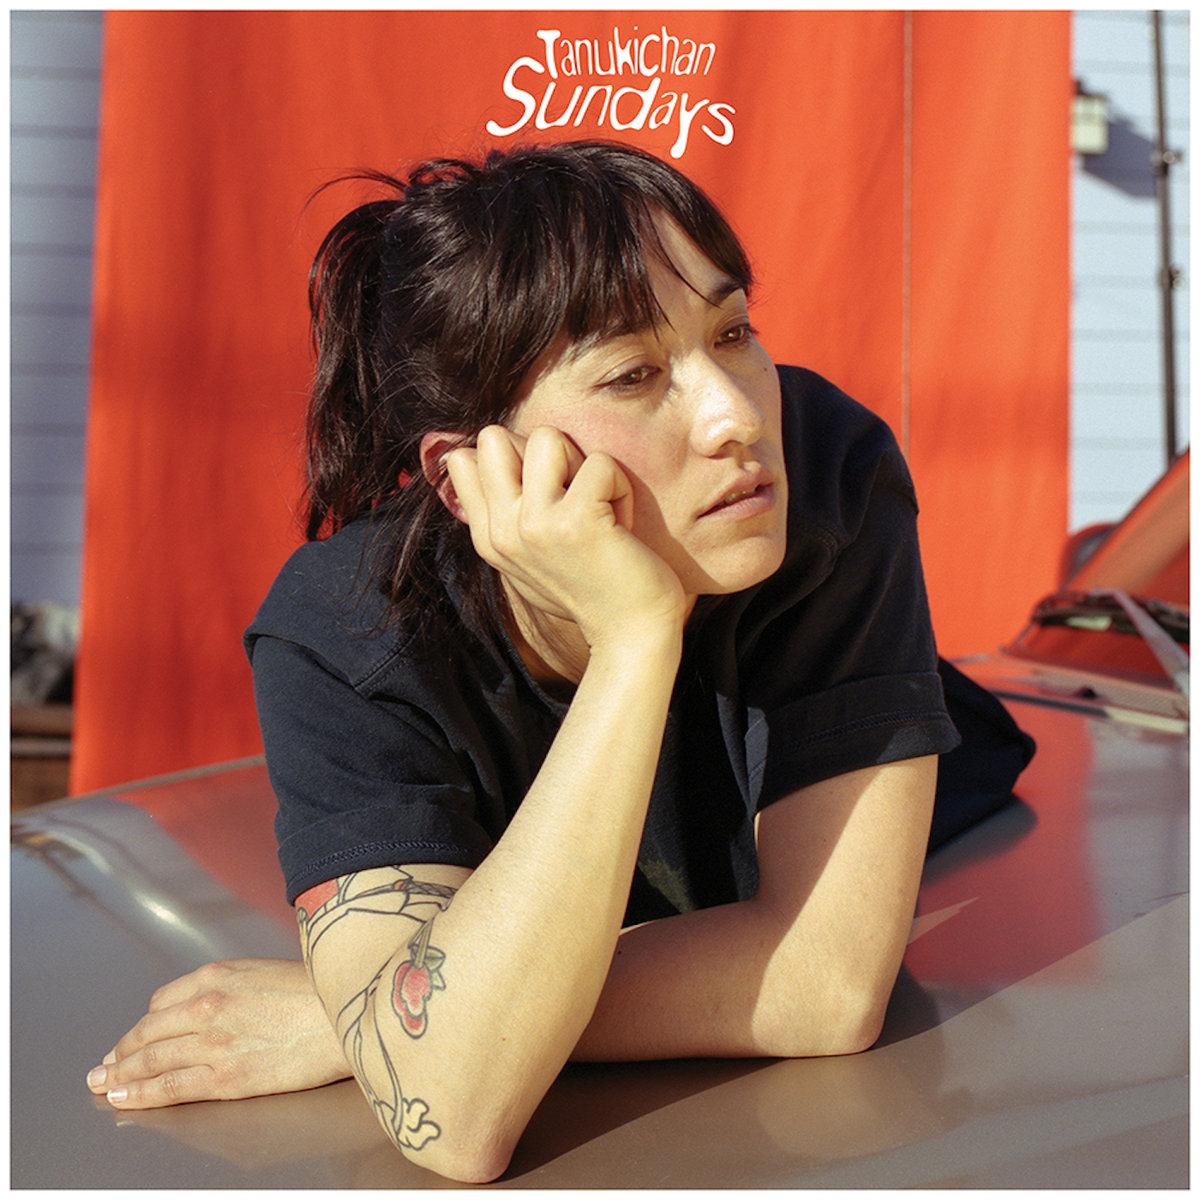 Tanukichan- Sundays (Company Record Label)